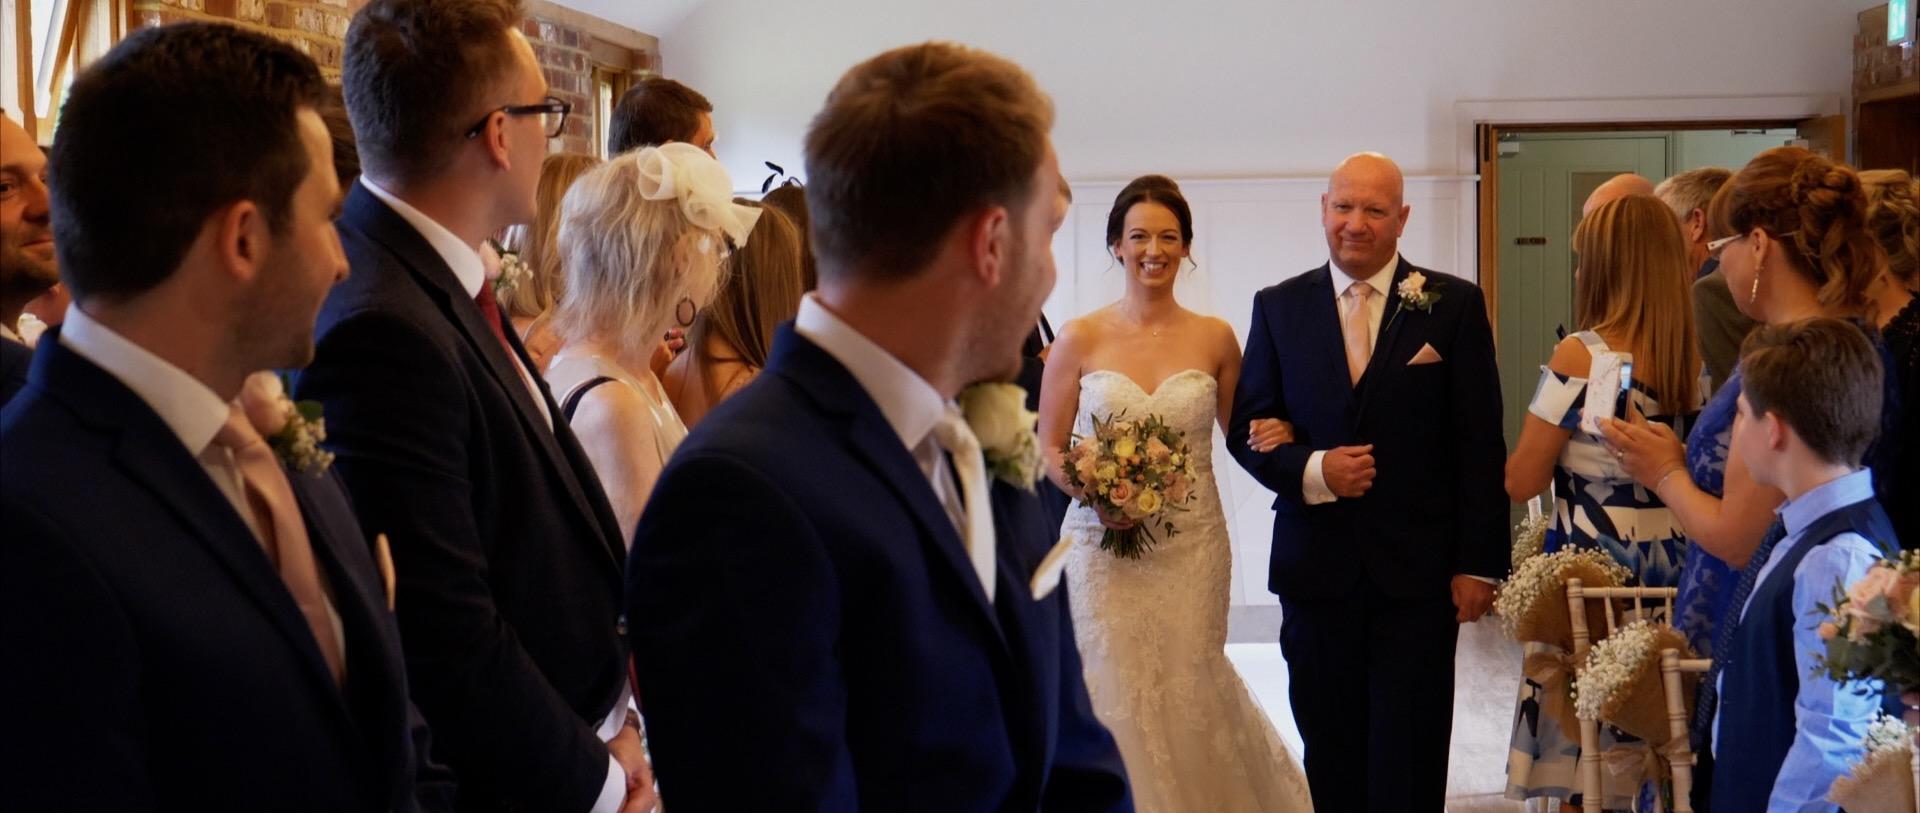 Wedding Ceremony Video Apton Hall Rochford.jpg